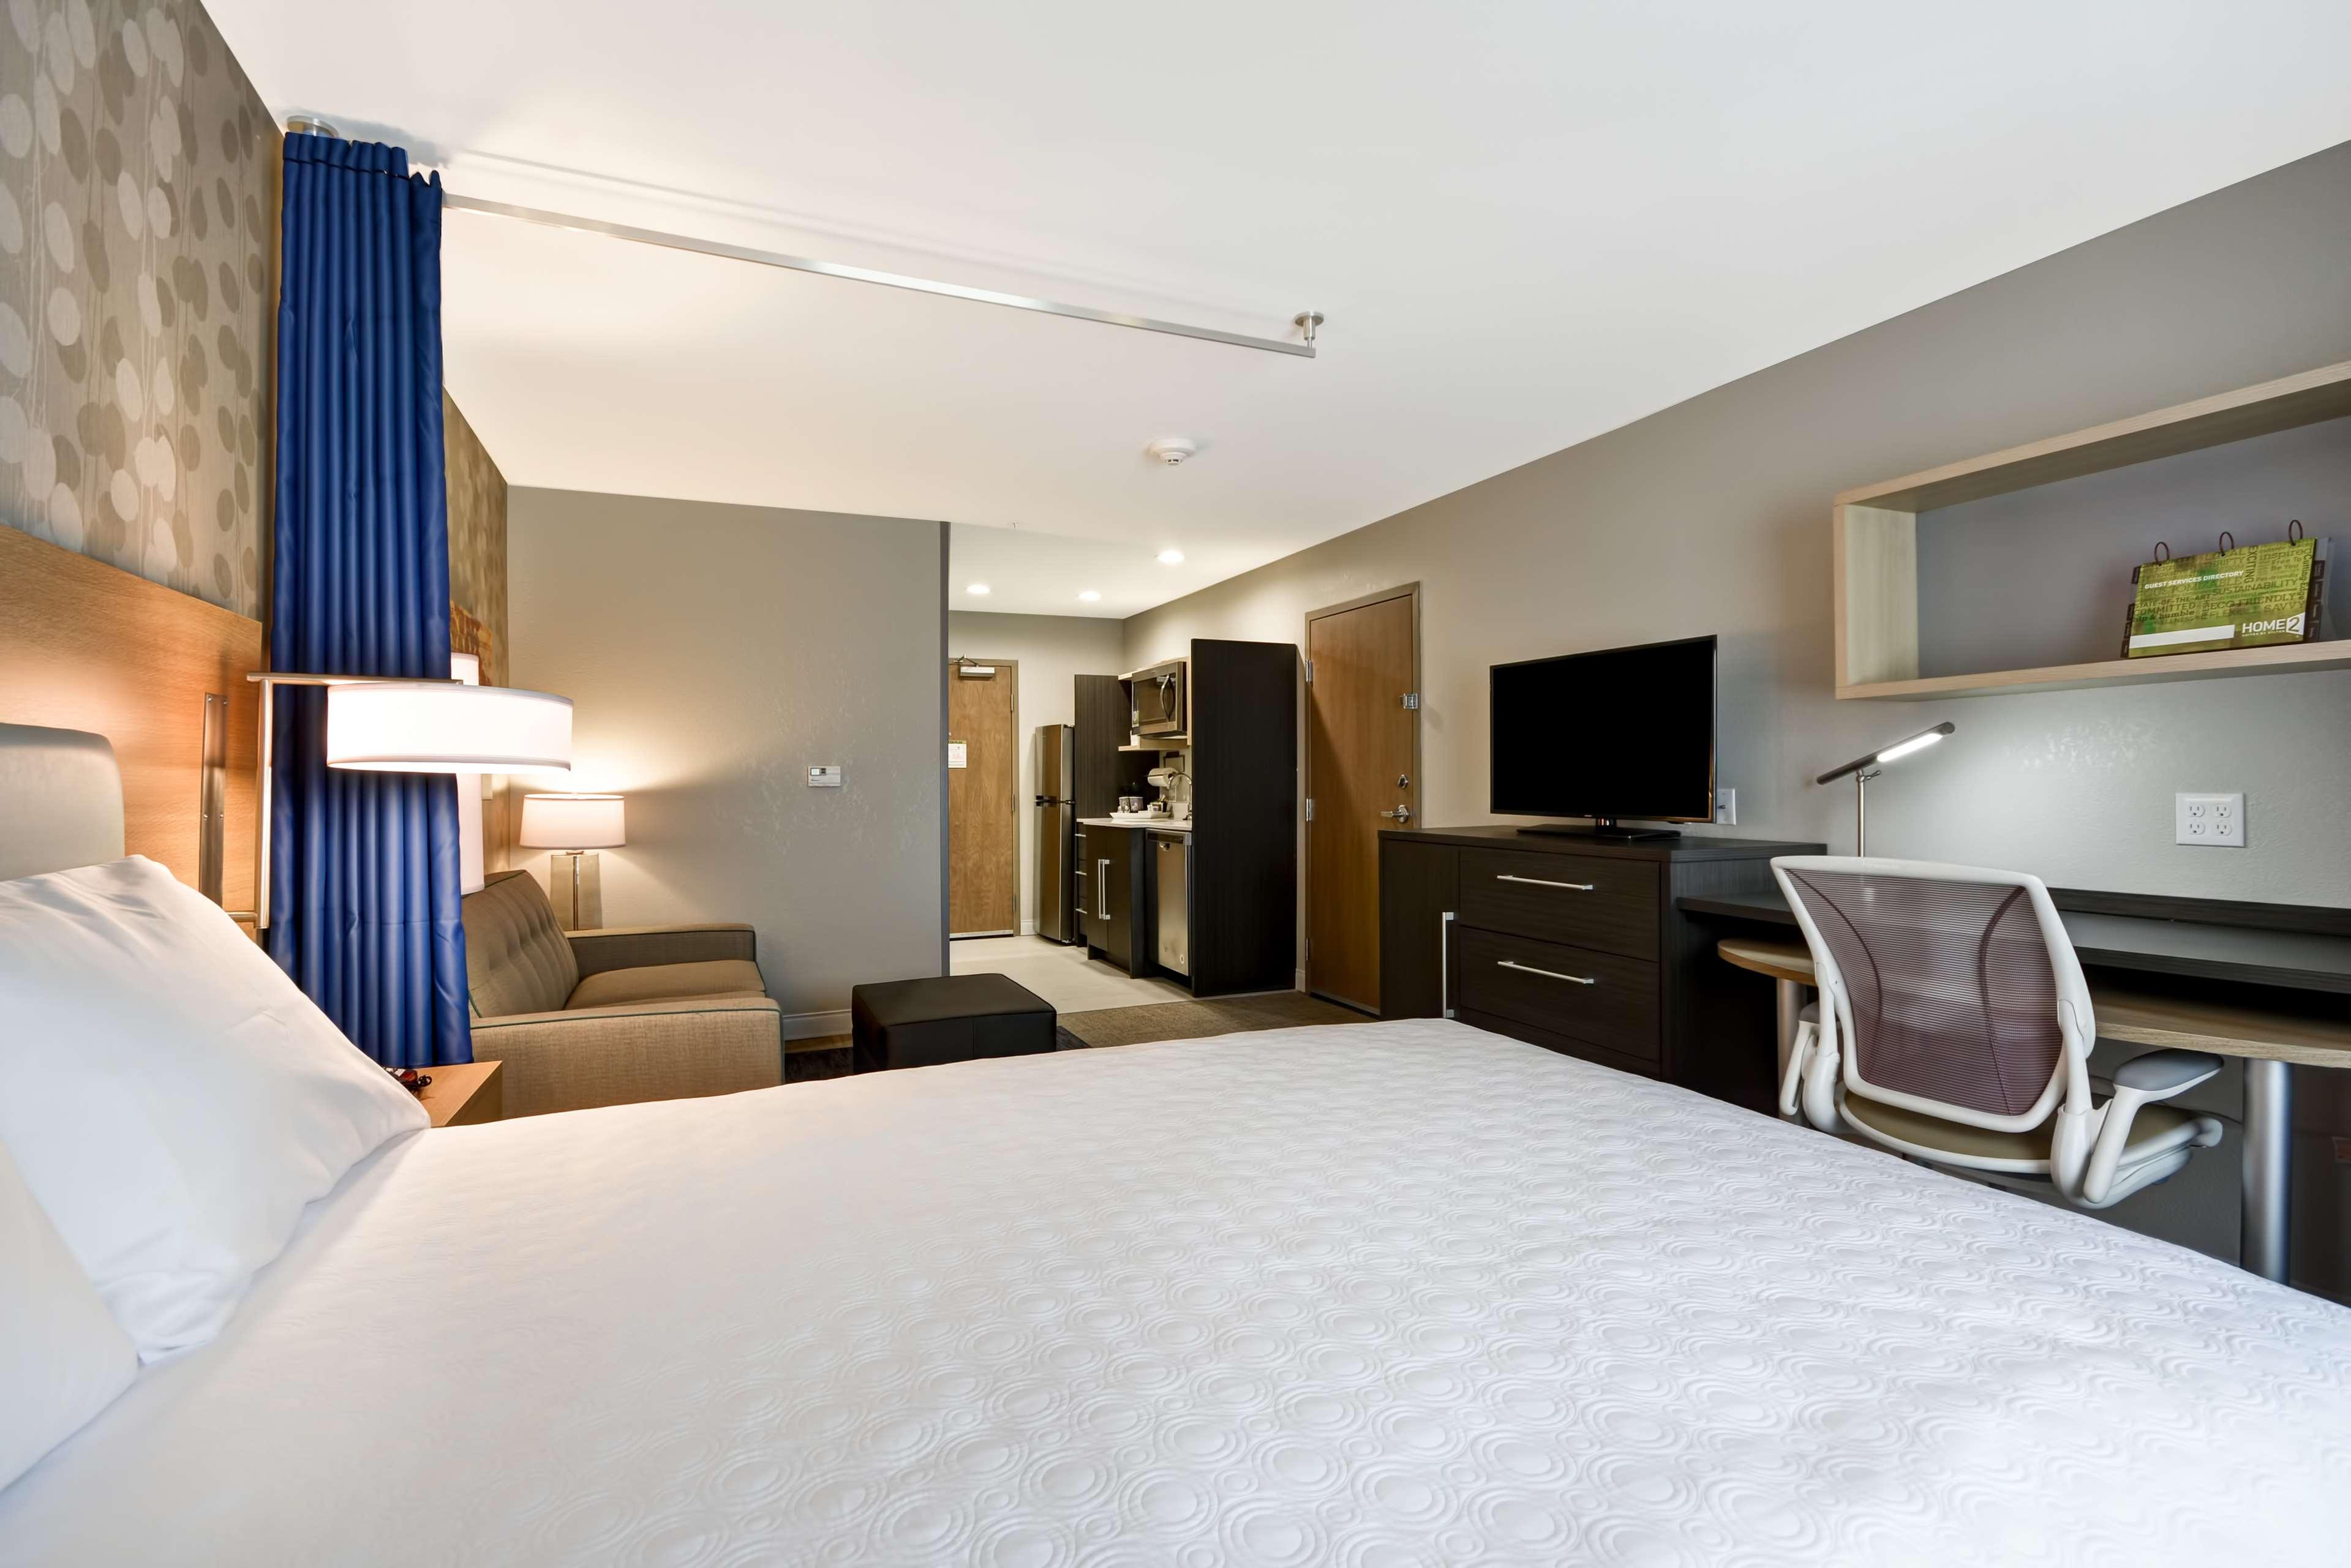 Home2 Suites by Hilton Jackson image 12